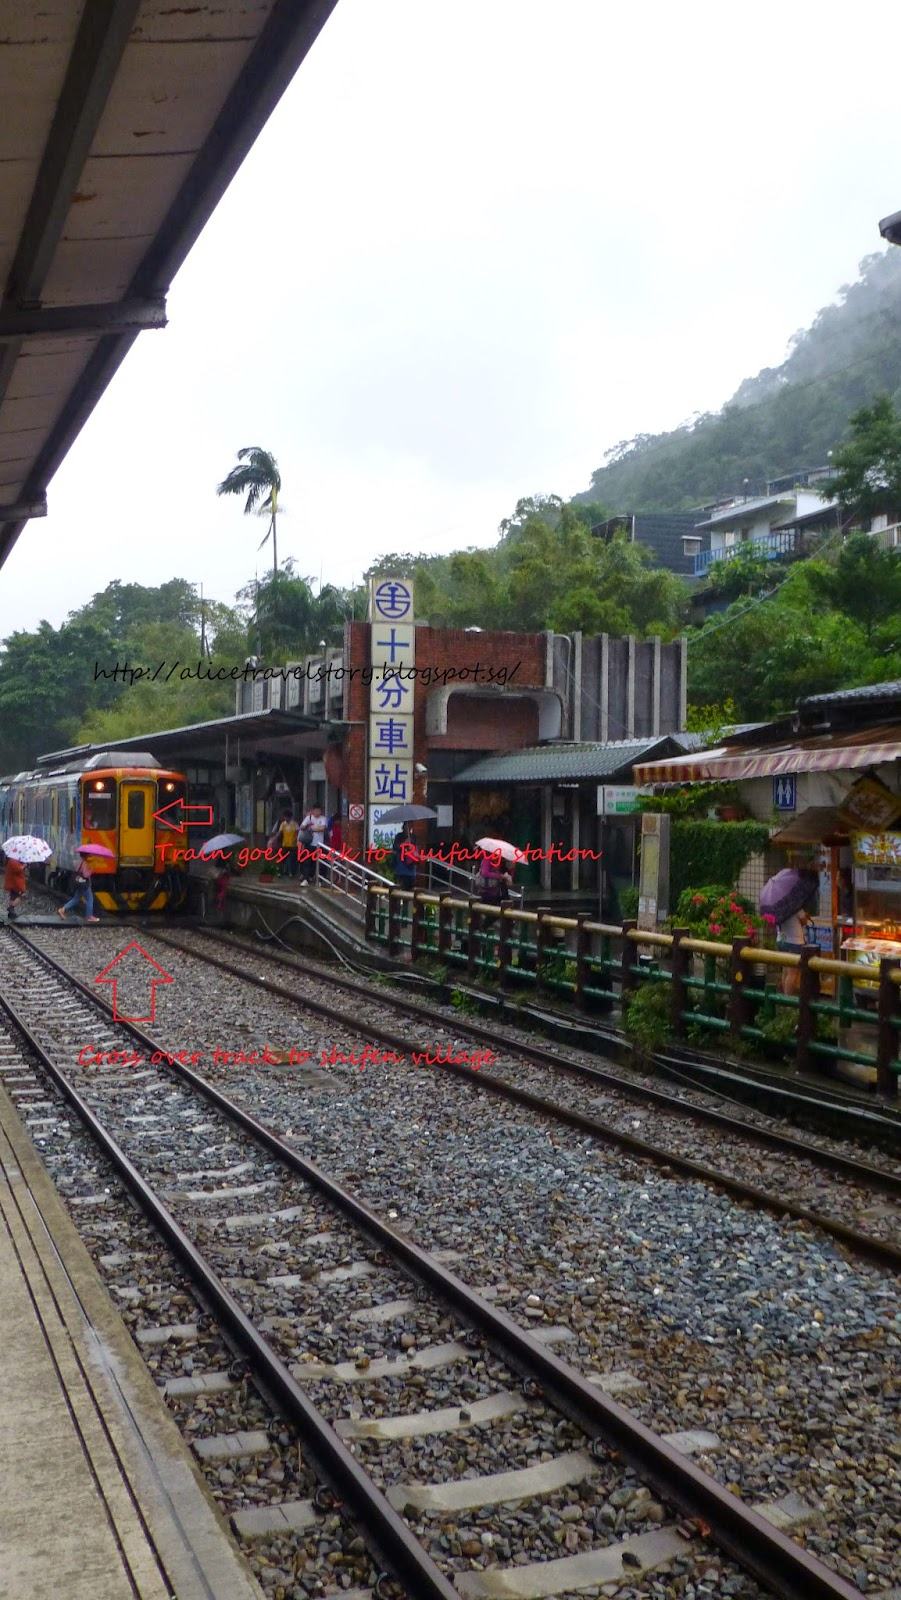 Alice Travelogue: Taiwan Trip 2014 - Day 4 - Making my way